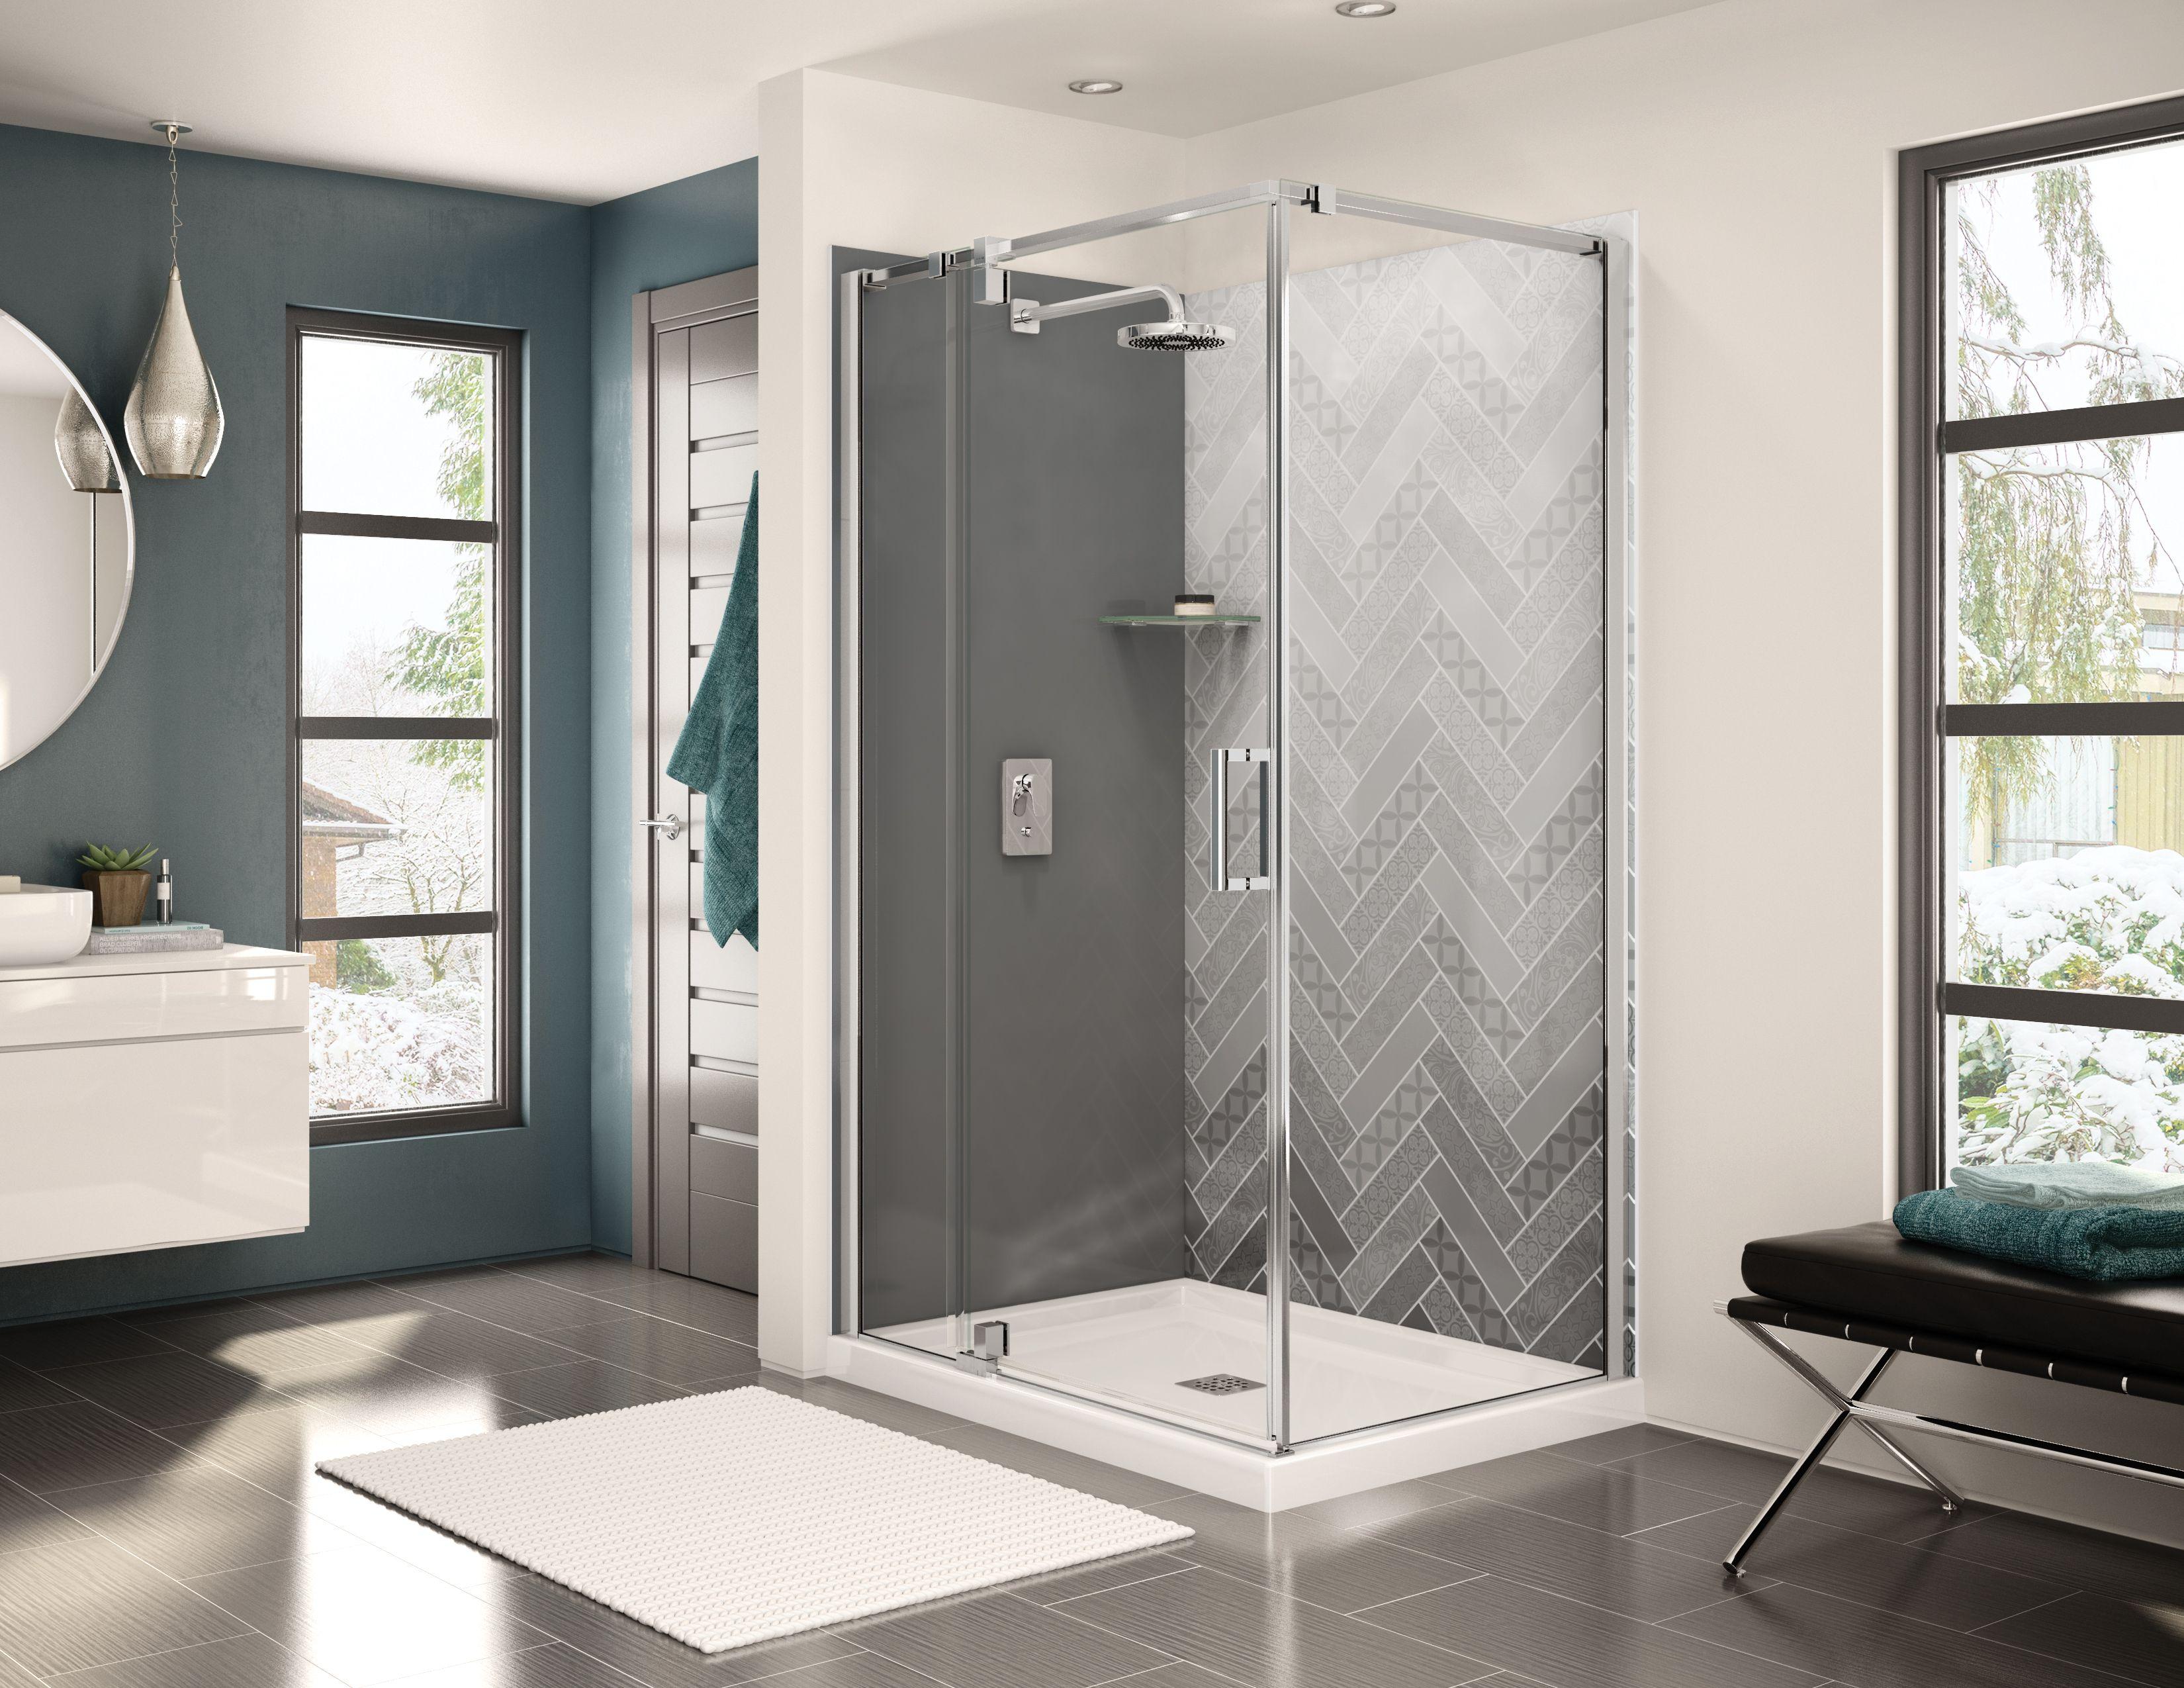 Utile Back Wall 48 In Maax Shower Wall Panels Bathroom Design Shower Wall